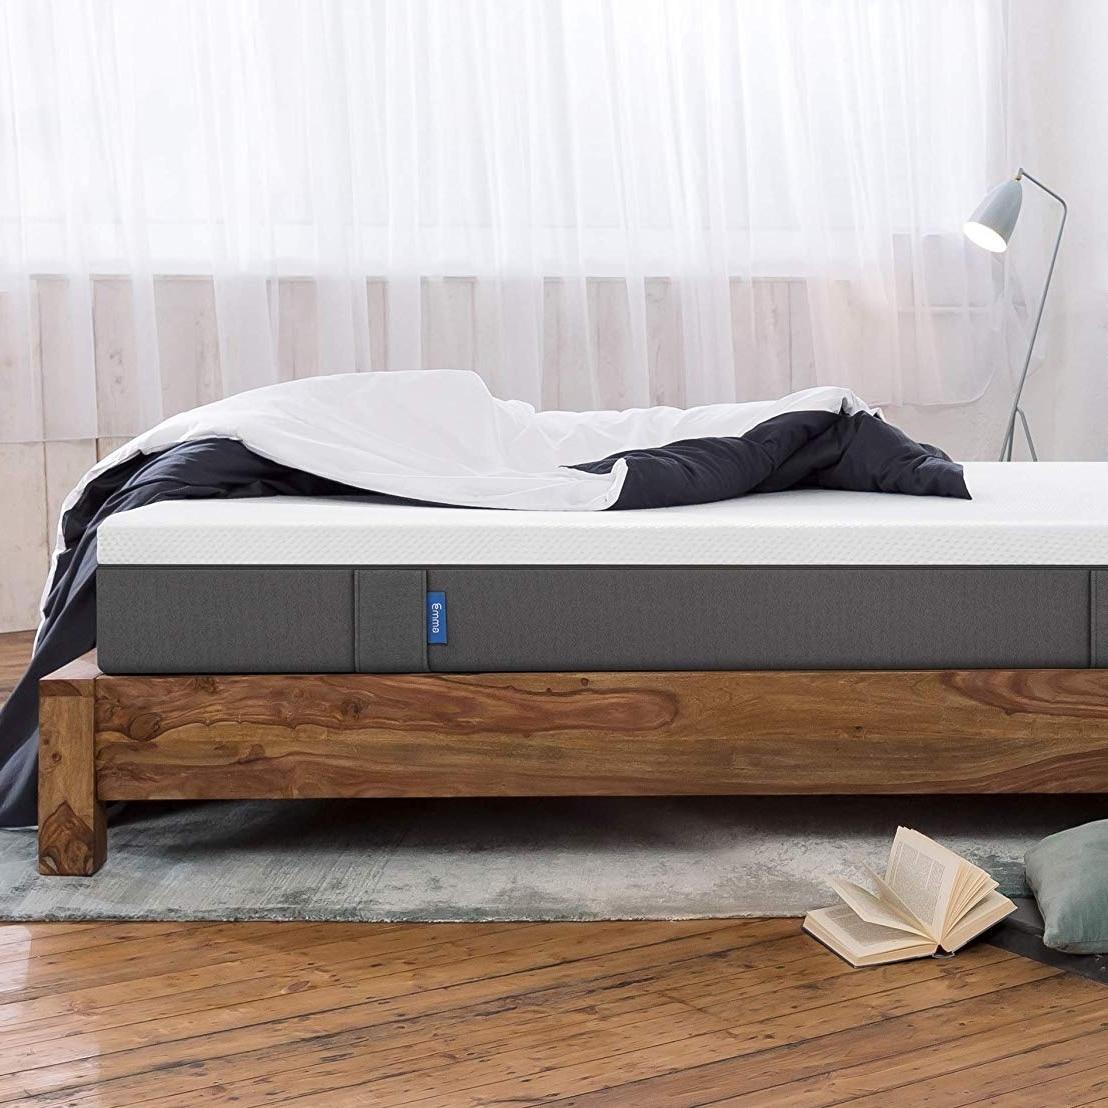 quel matelas choisir quand on a mal au dos. Black Bedroom Furniture Sets. Home Design Ideas